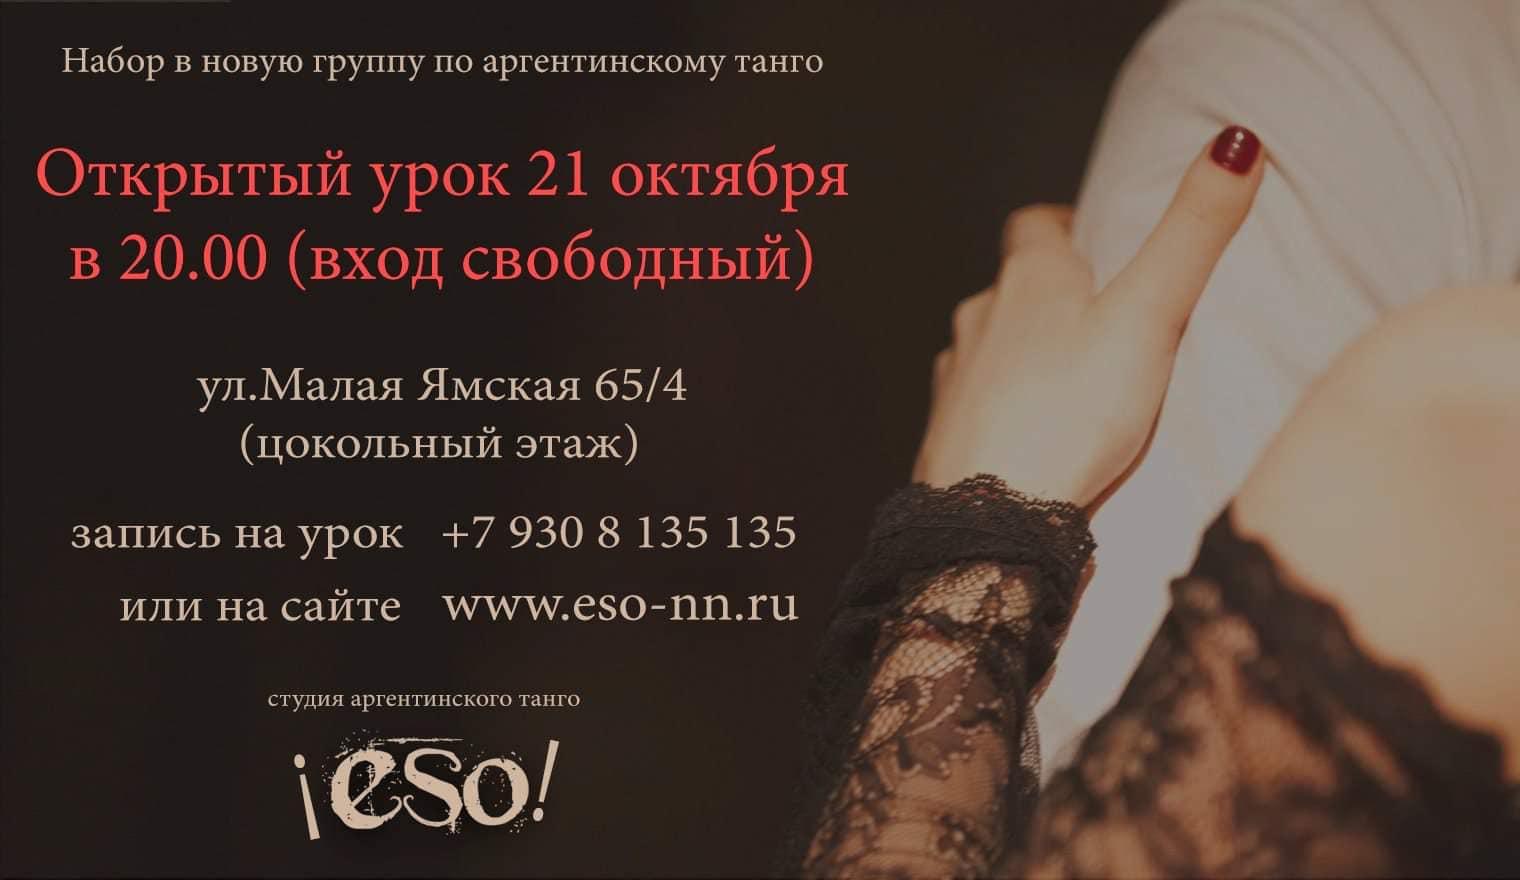 243327040_5123412184341291_1020910946565444591_n